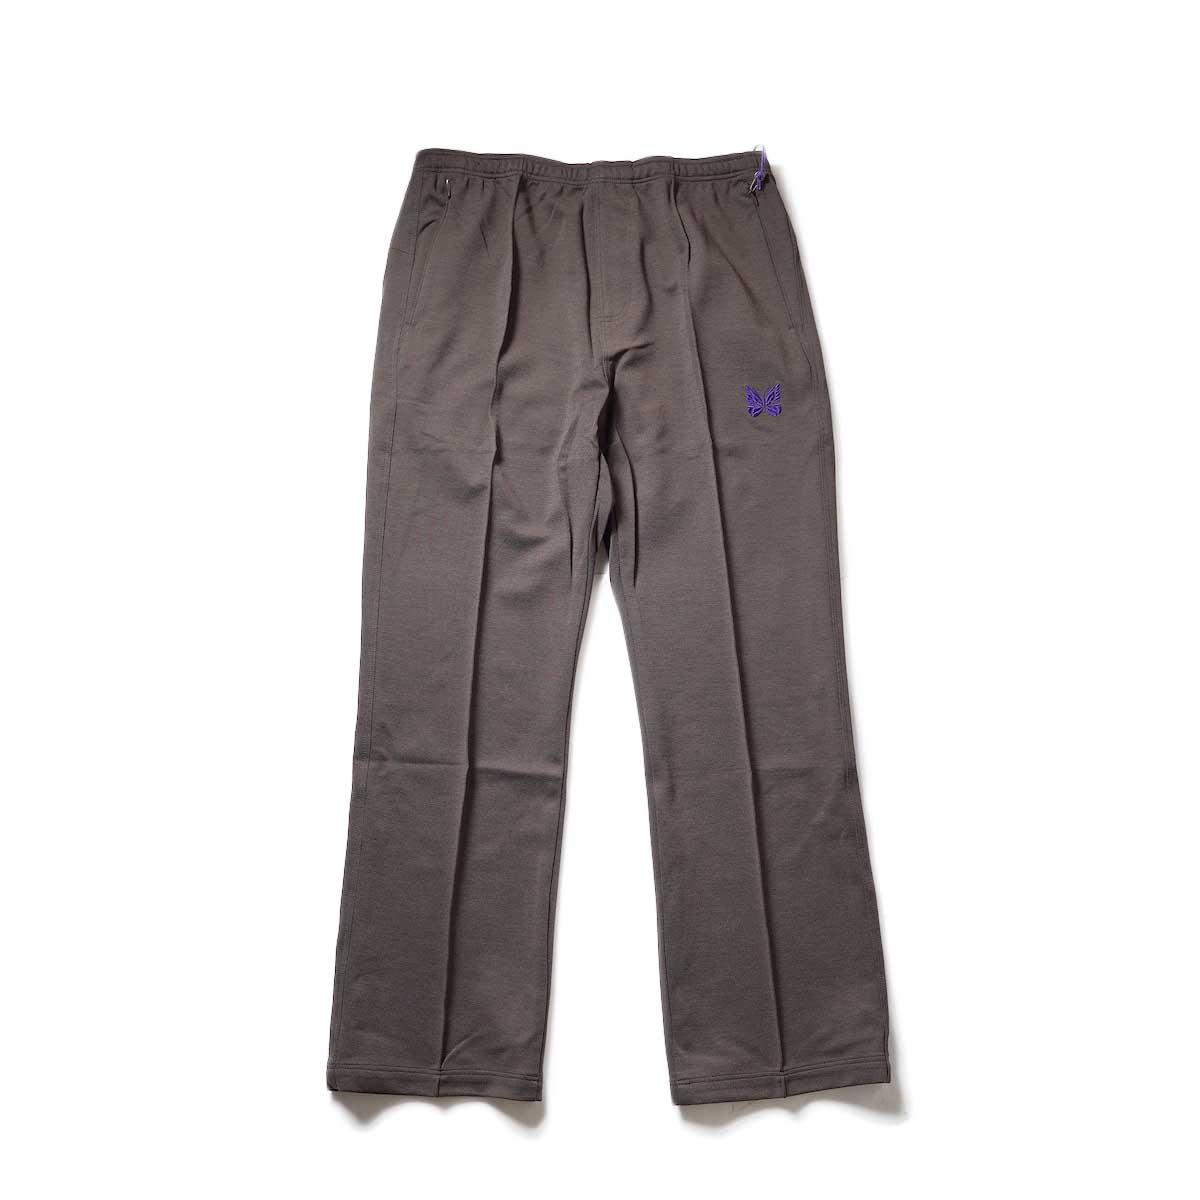 Needles / W.U. Boot-Cut Pant - Poly Twill Jersey (Brown)